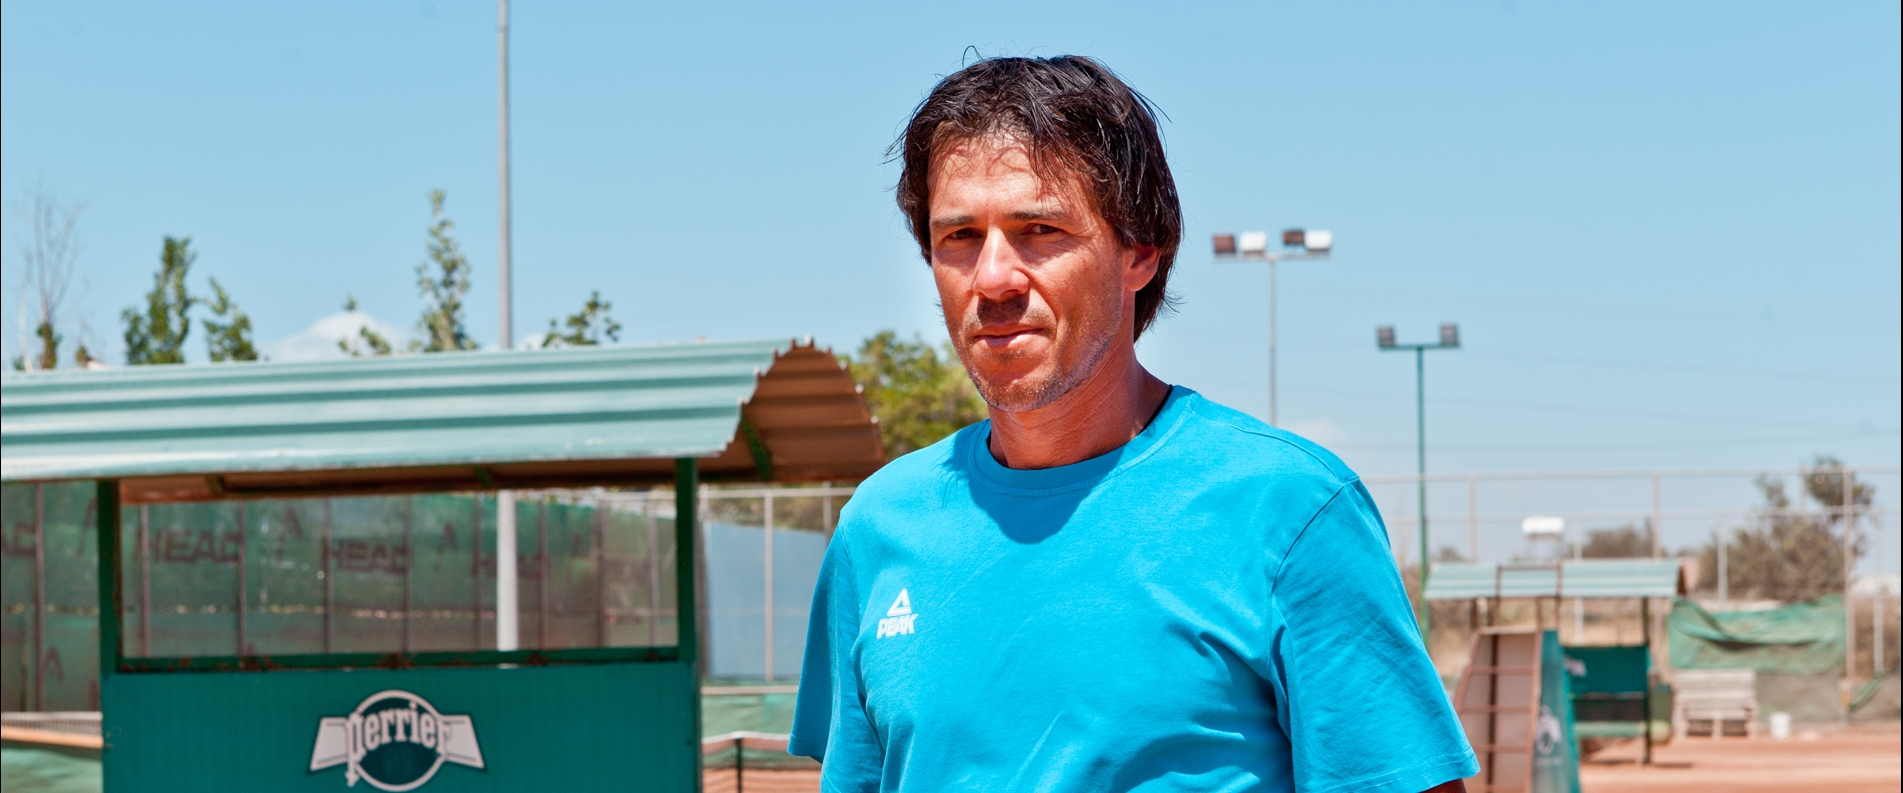 Polis Ioannides: Tennis is my Life